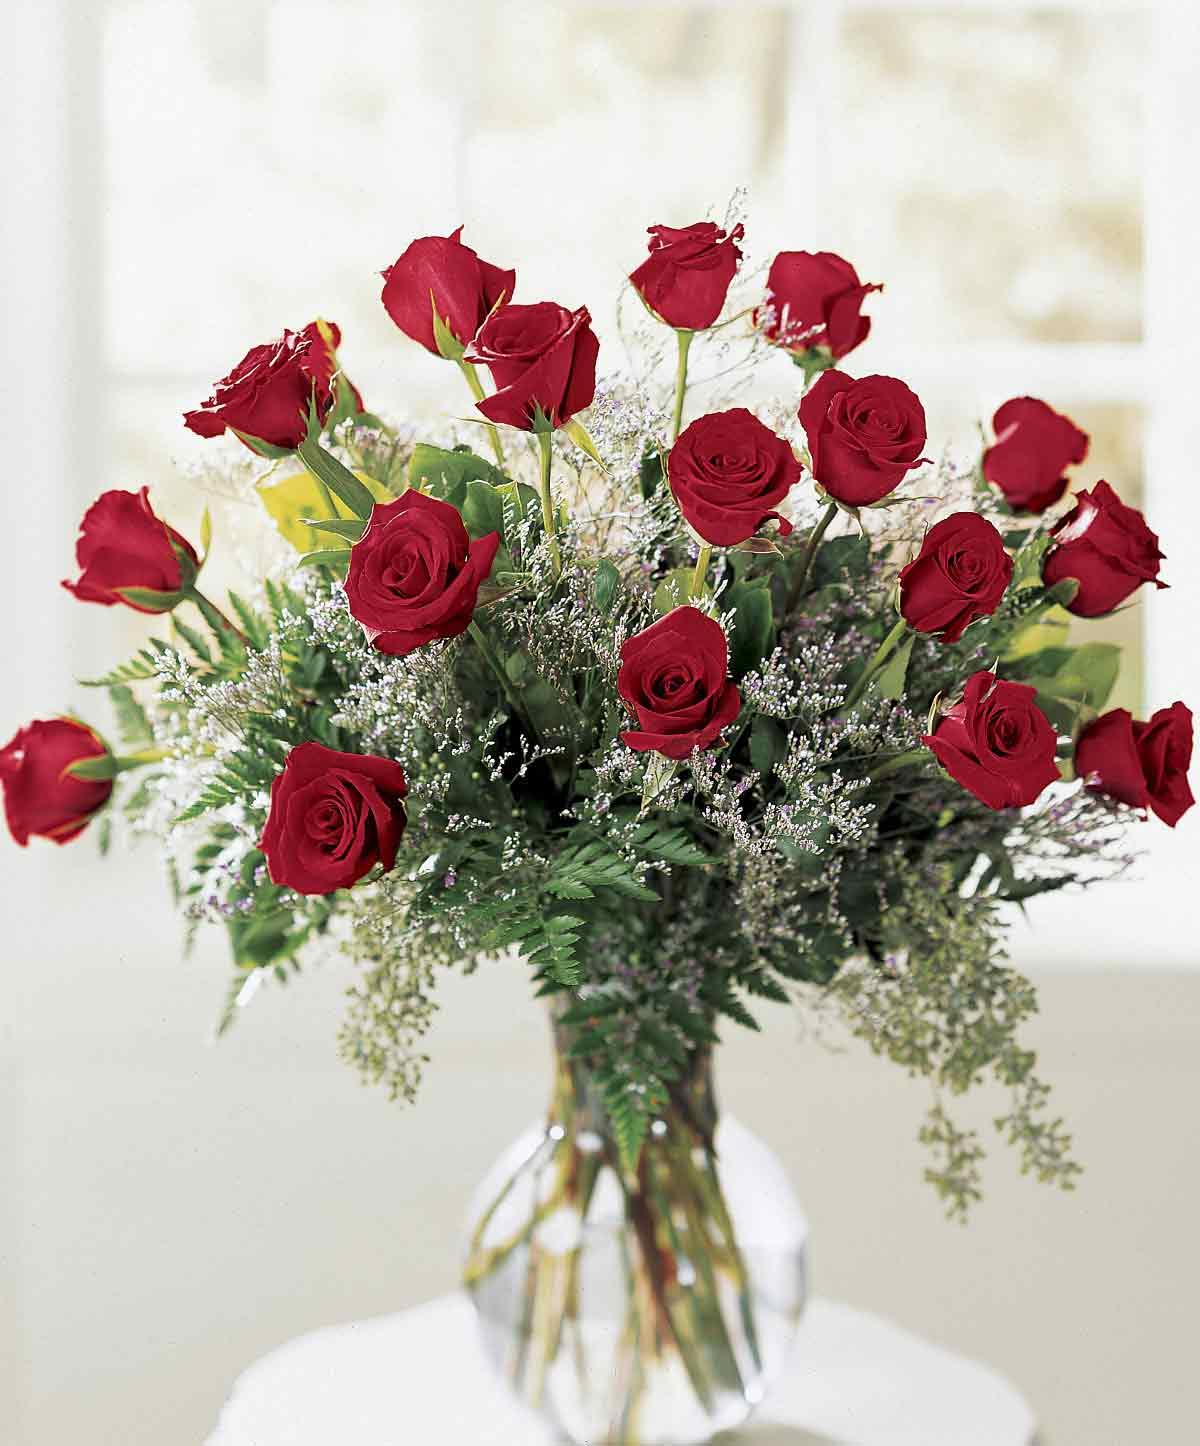 Rose Flower Love: Wedding Flowers: Love Flowers Roses